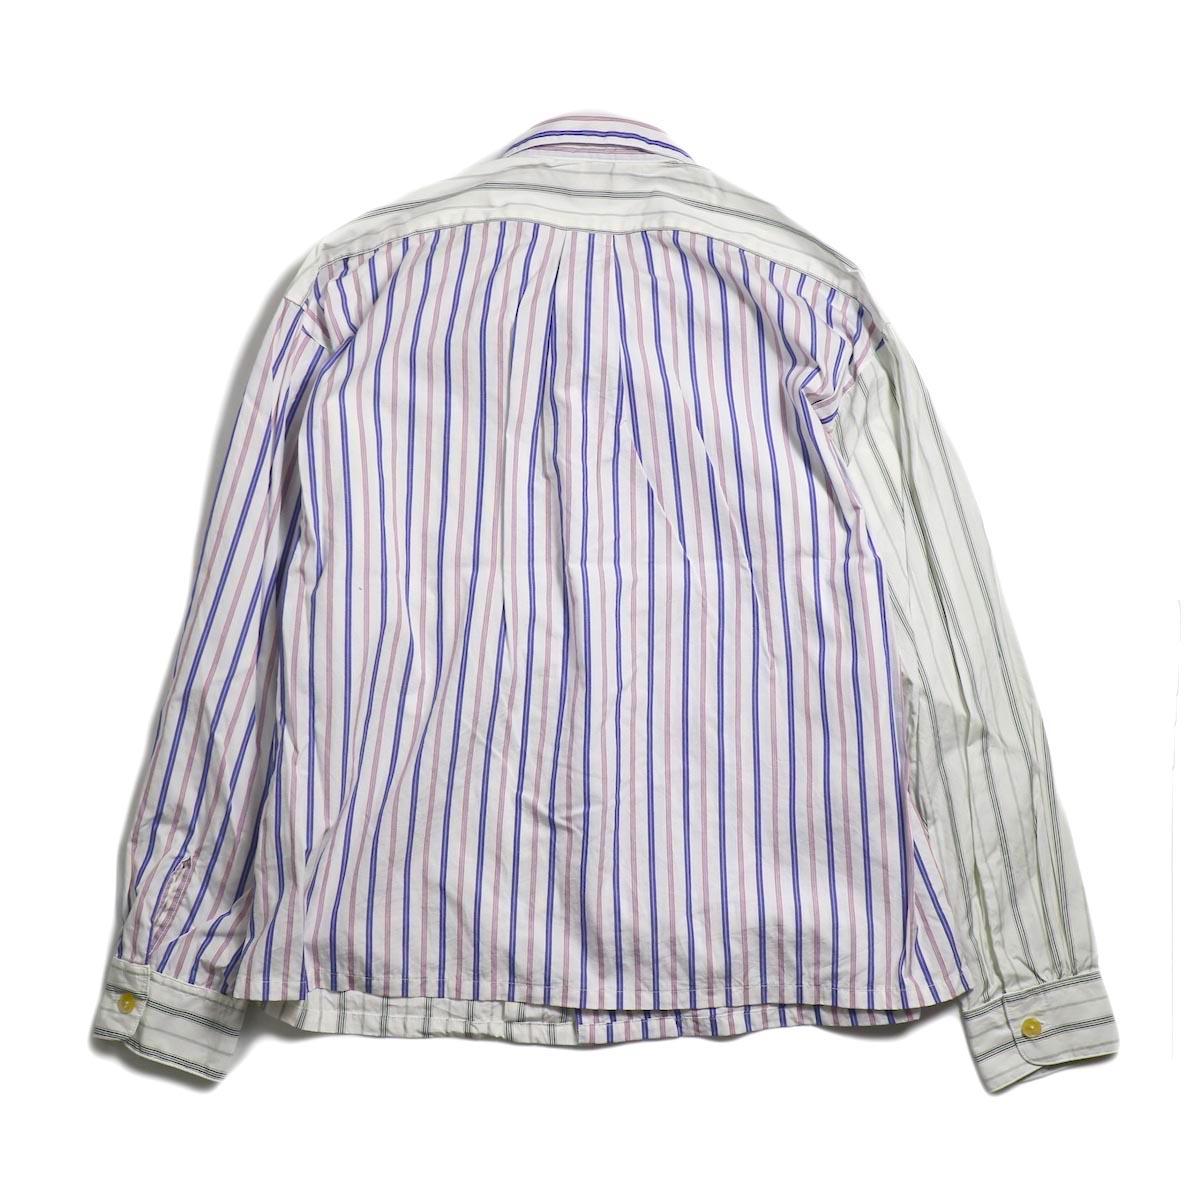 AiE / PJ Shirt -Regent St. (Red/Blu/Wht) 背面